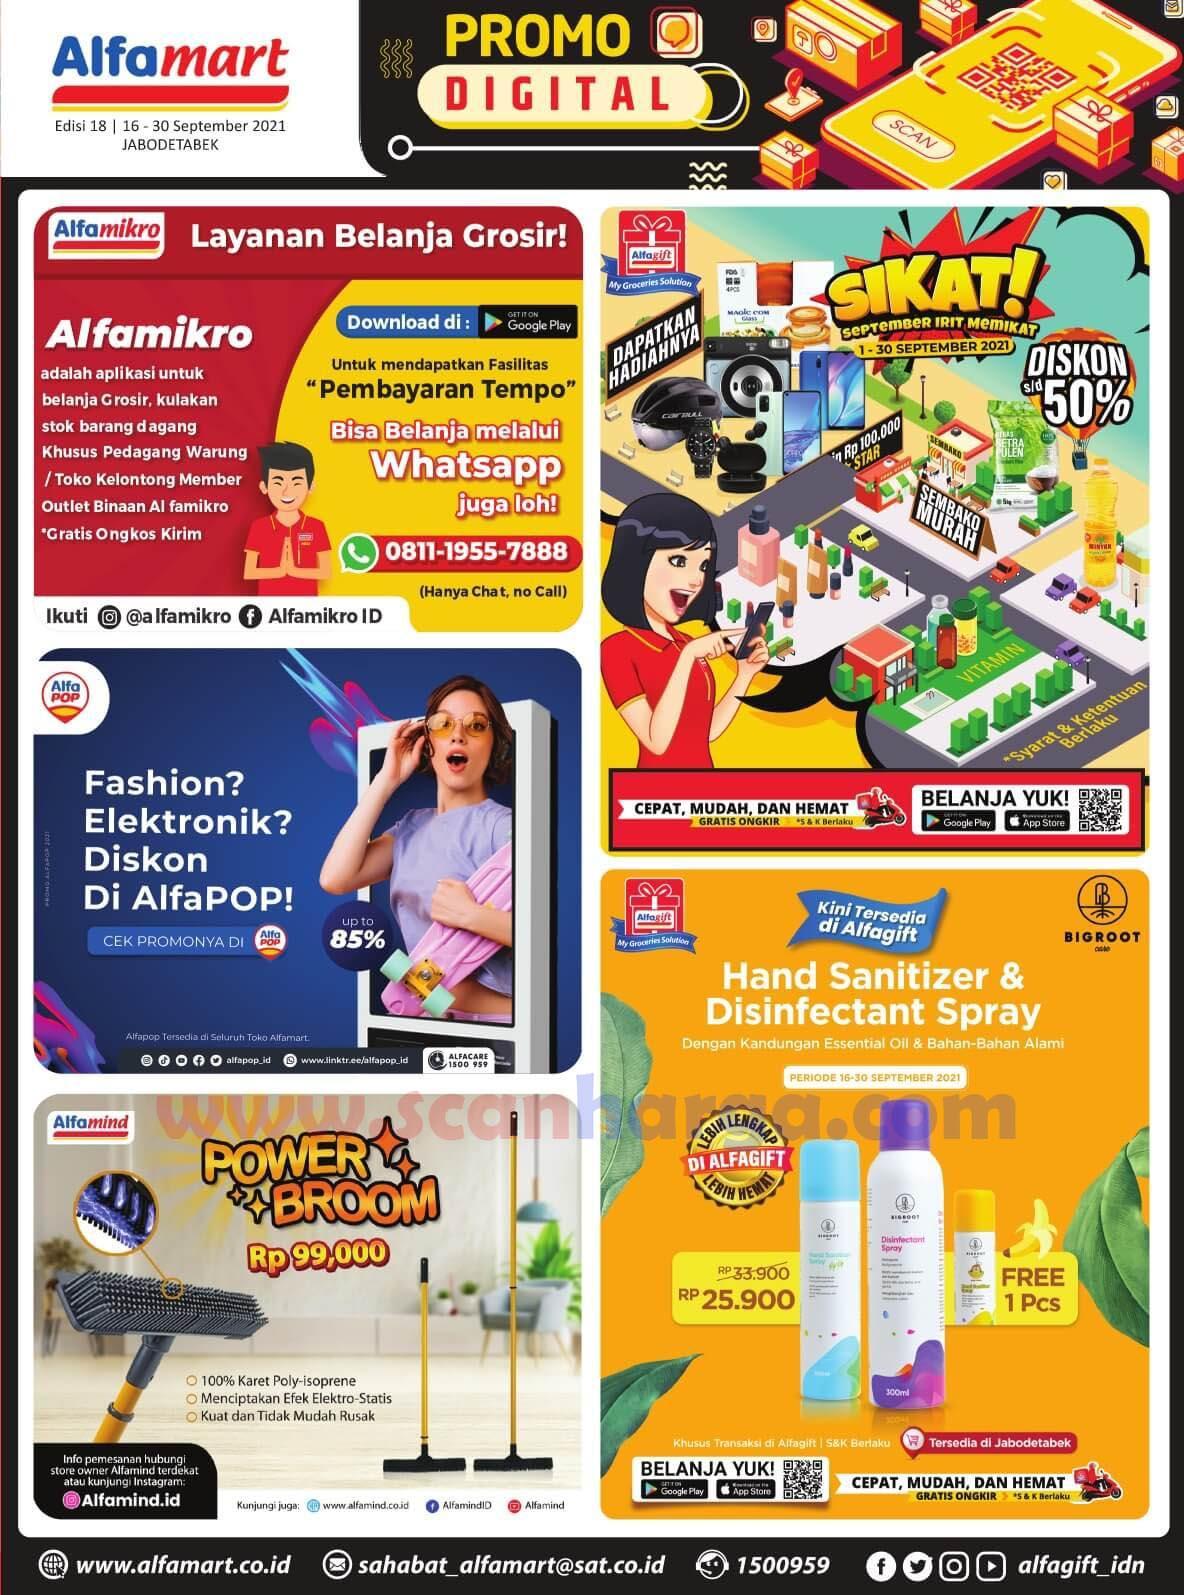 Katalog Promo Alfamart 16 - 30 September 2021 15